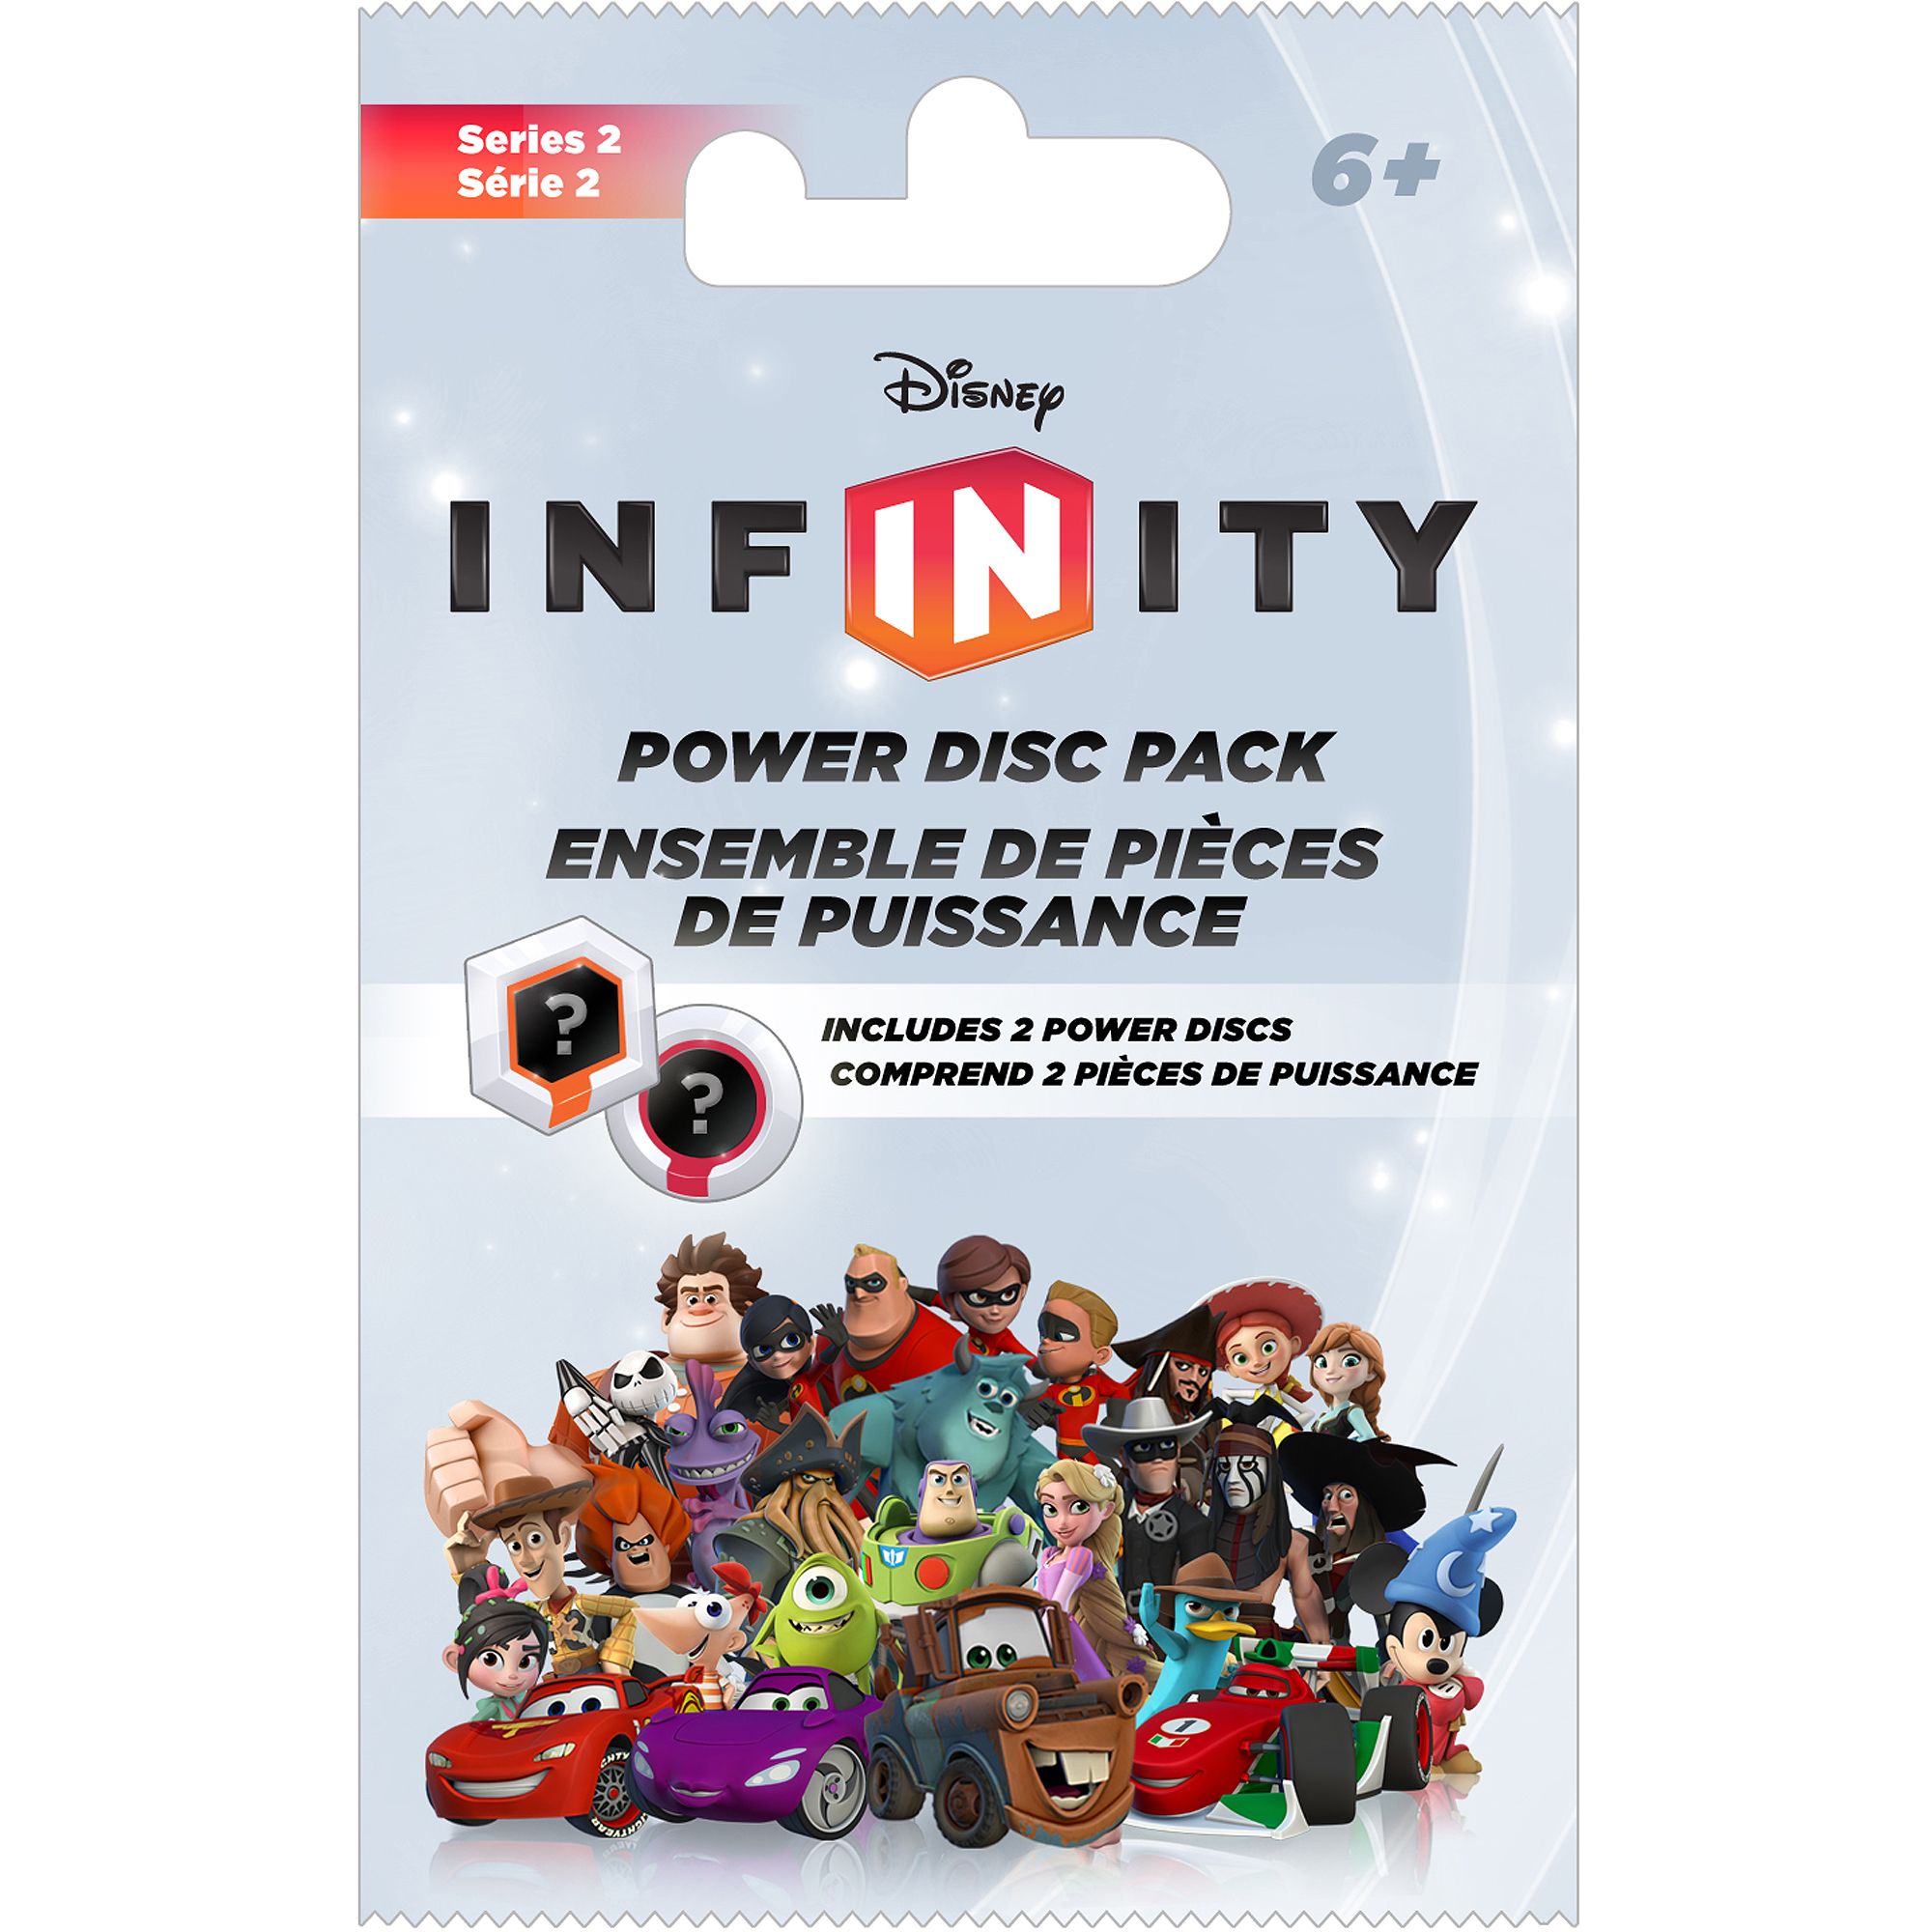 Disney Infinity Power Disc 2-Pack Series 2 (Universal) by Disney